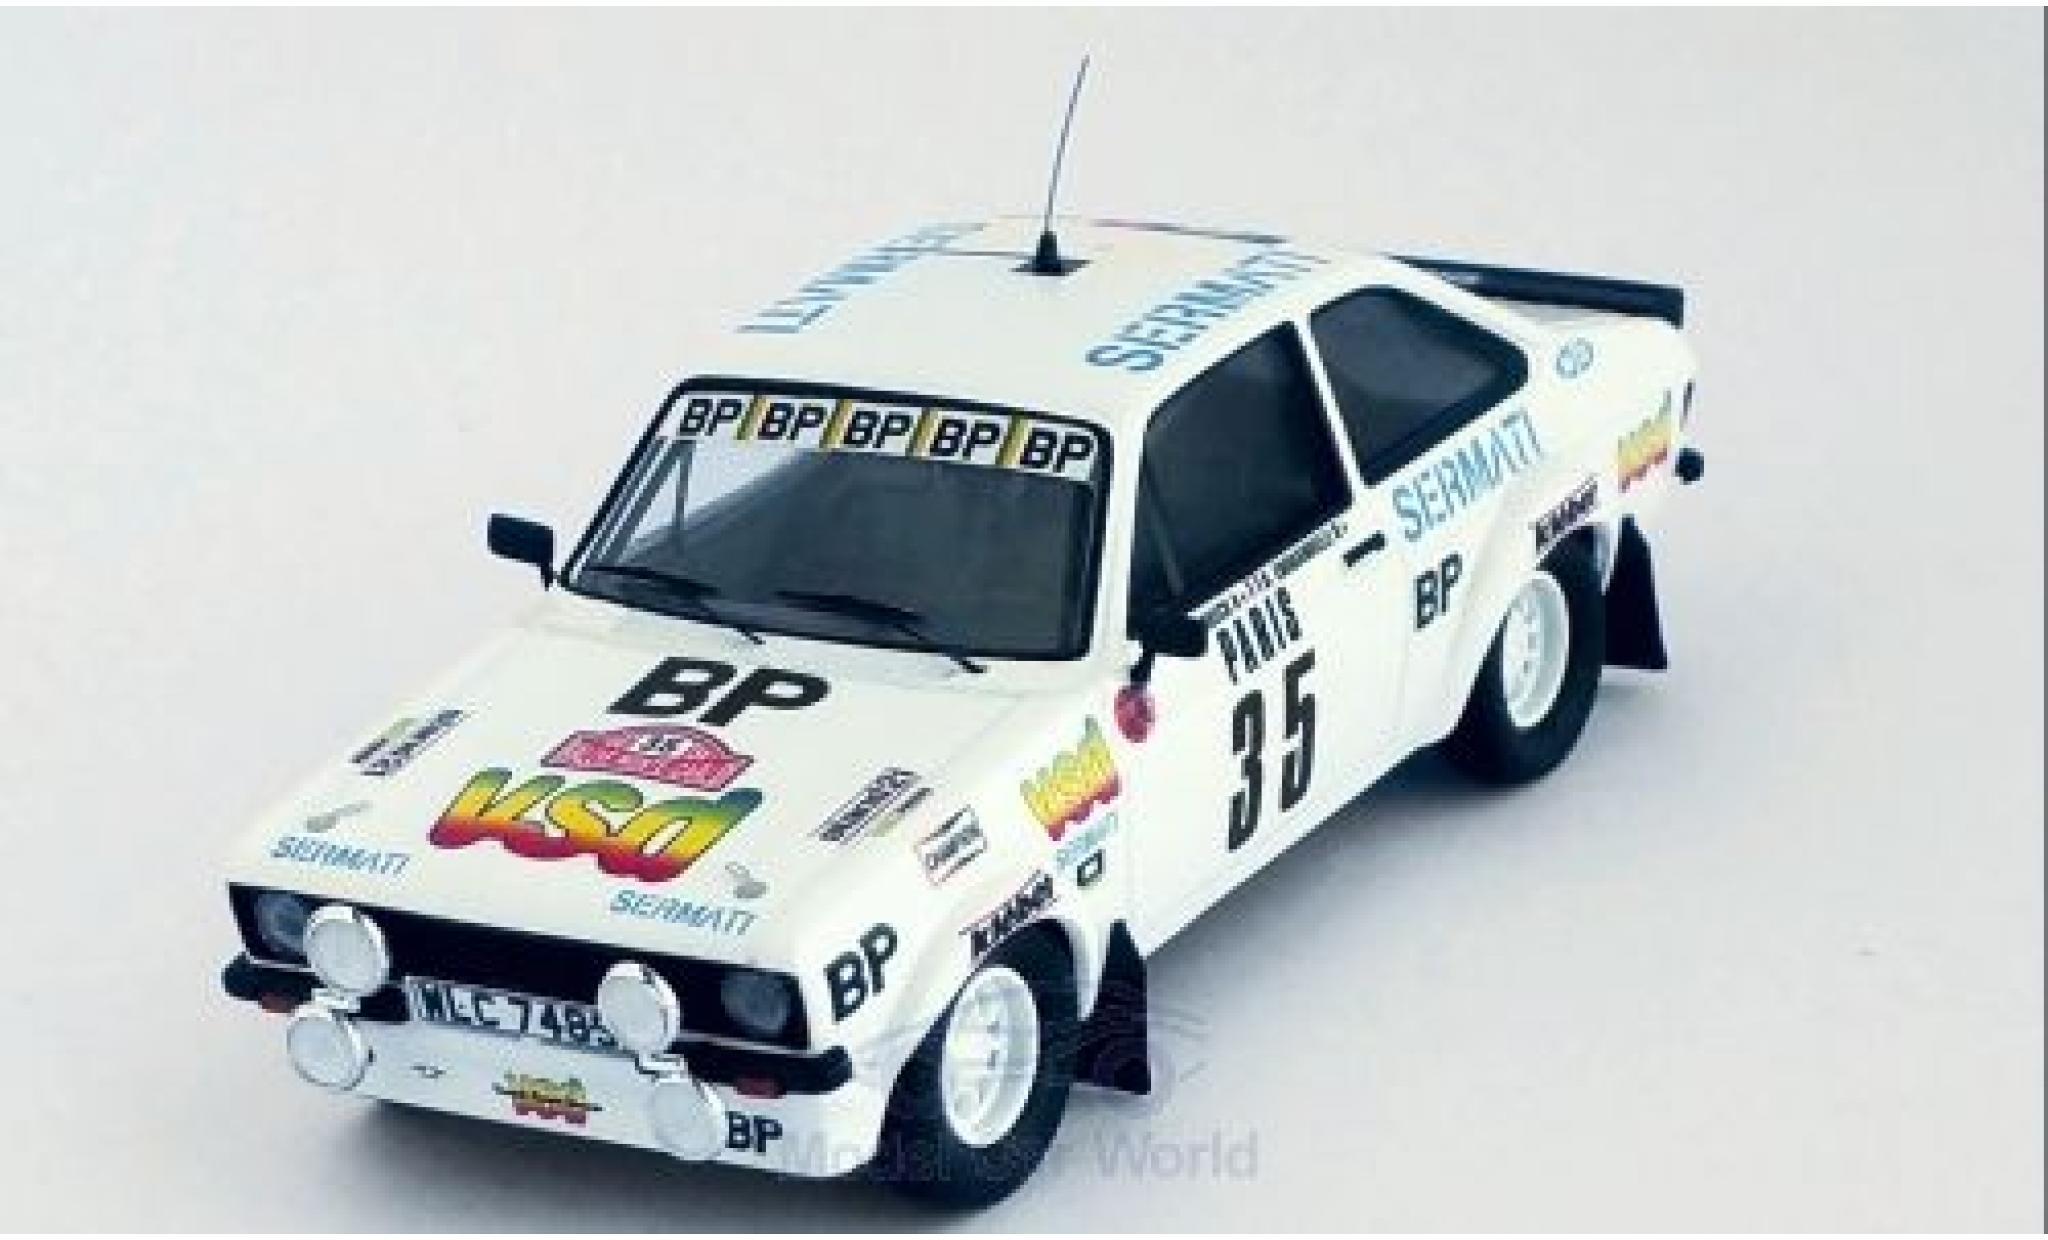 Ford Escort 1981 1/43 Trofeu MK II RS 1800 No.35 vsd Rallye WM Rallye Monte Carlo D.Snobeck/D.Emmanuelli